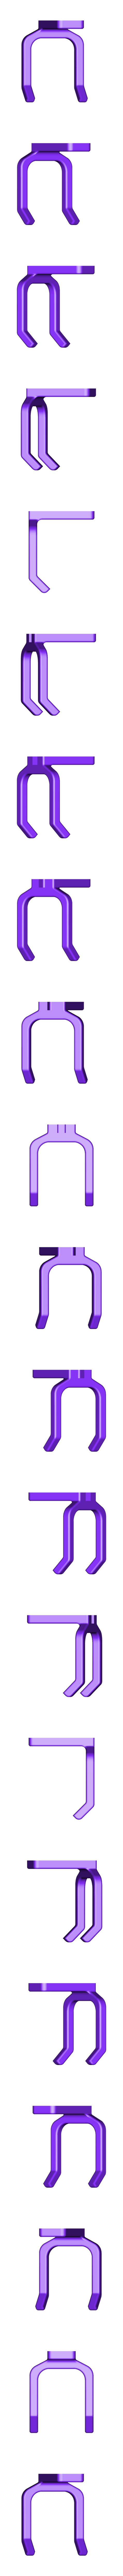 Skadis_Universal_Fork_25_30mm.stl Download free STL file IKEA SKADIS Collection (easy print / tight fit) • 3D print object, CSD_Salzburg